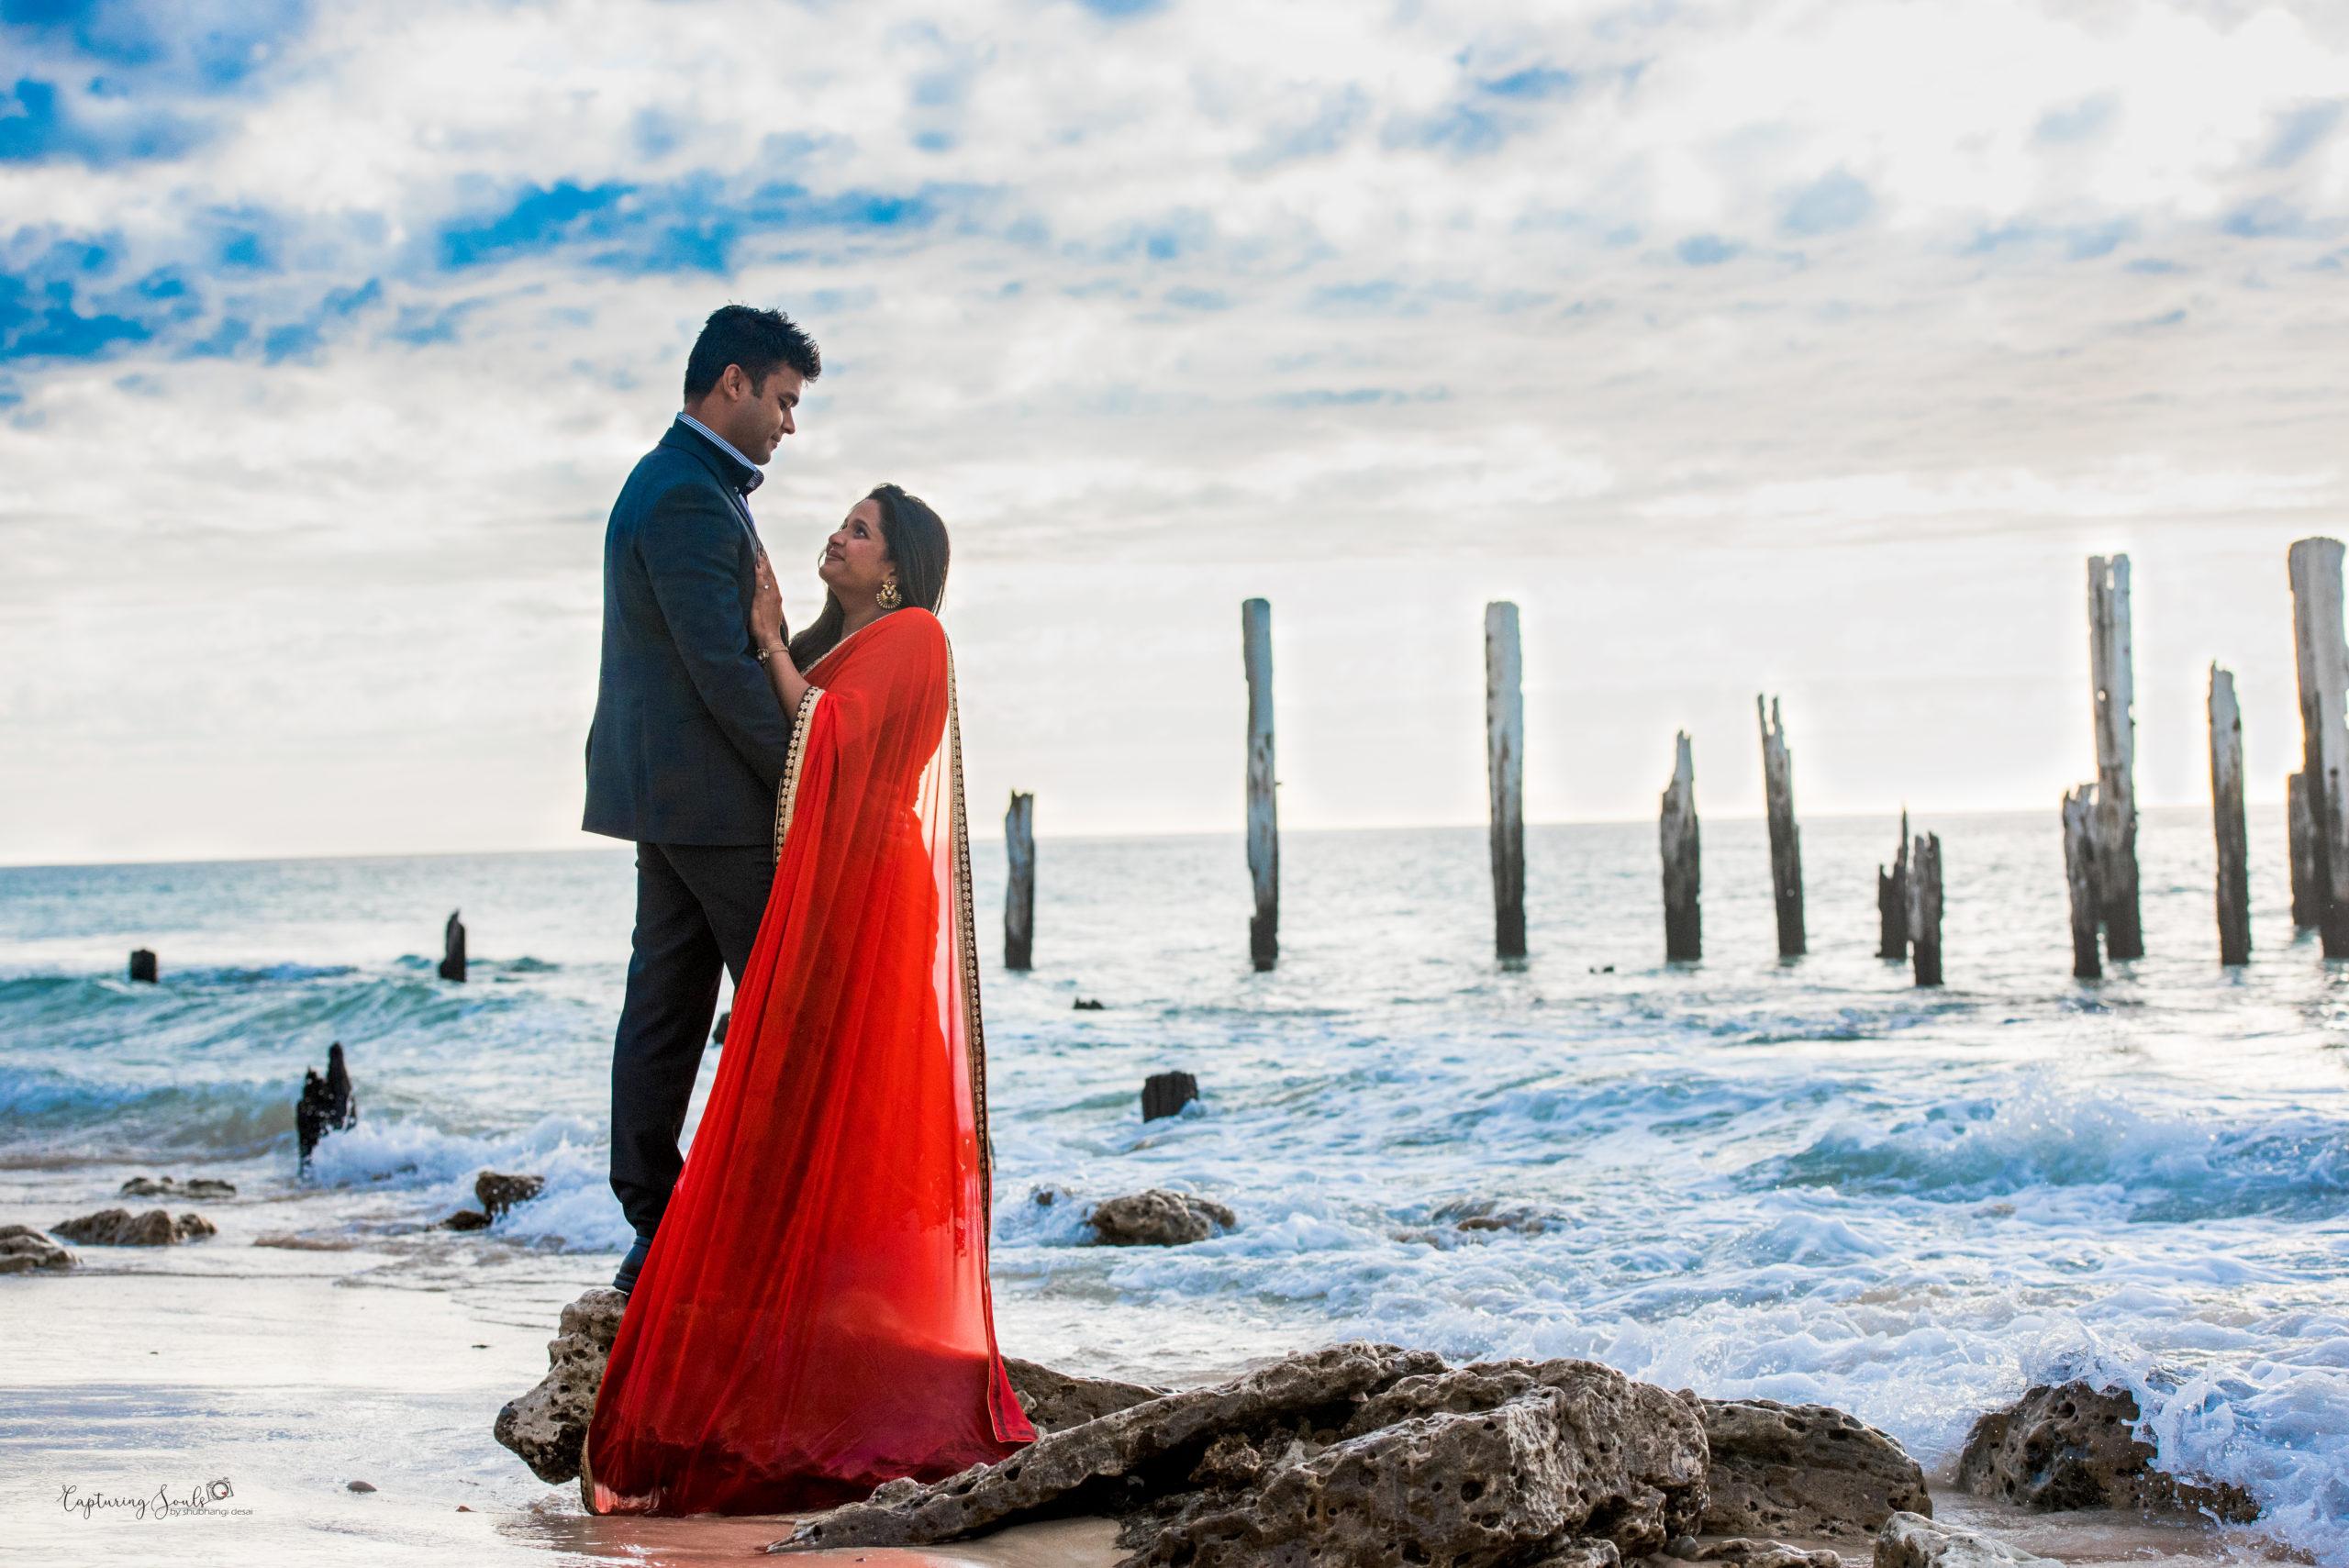 A deep dive on Wedding shoots during lockdown weddings